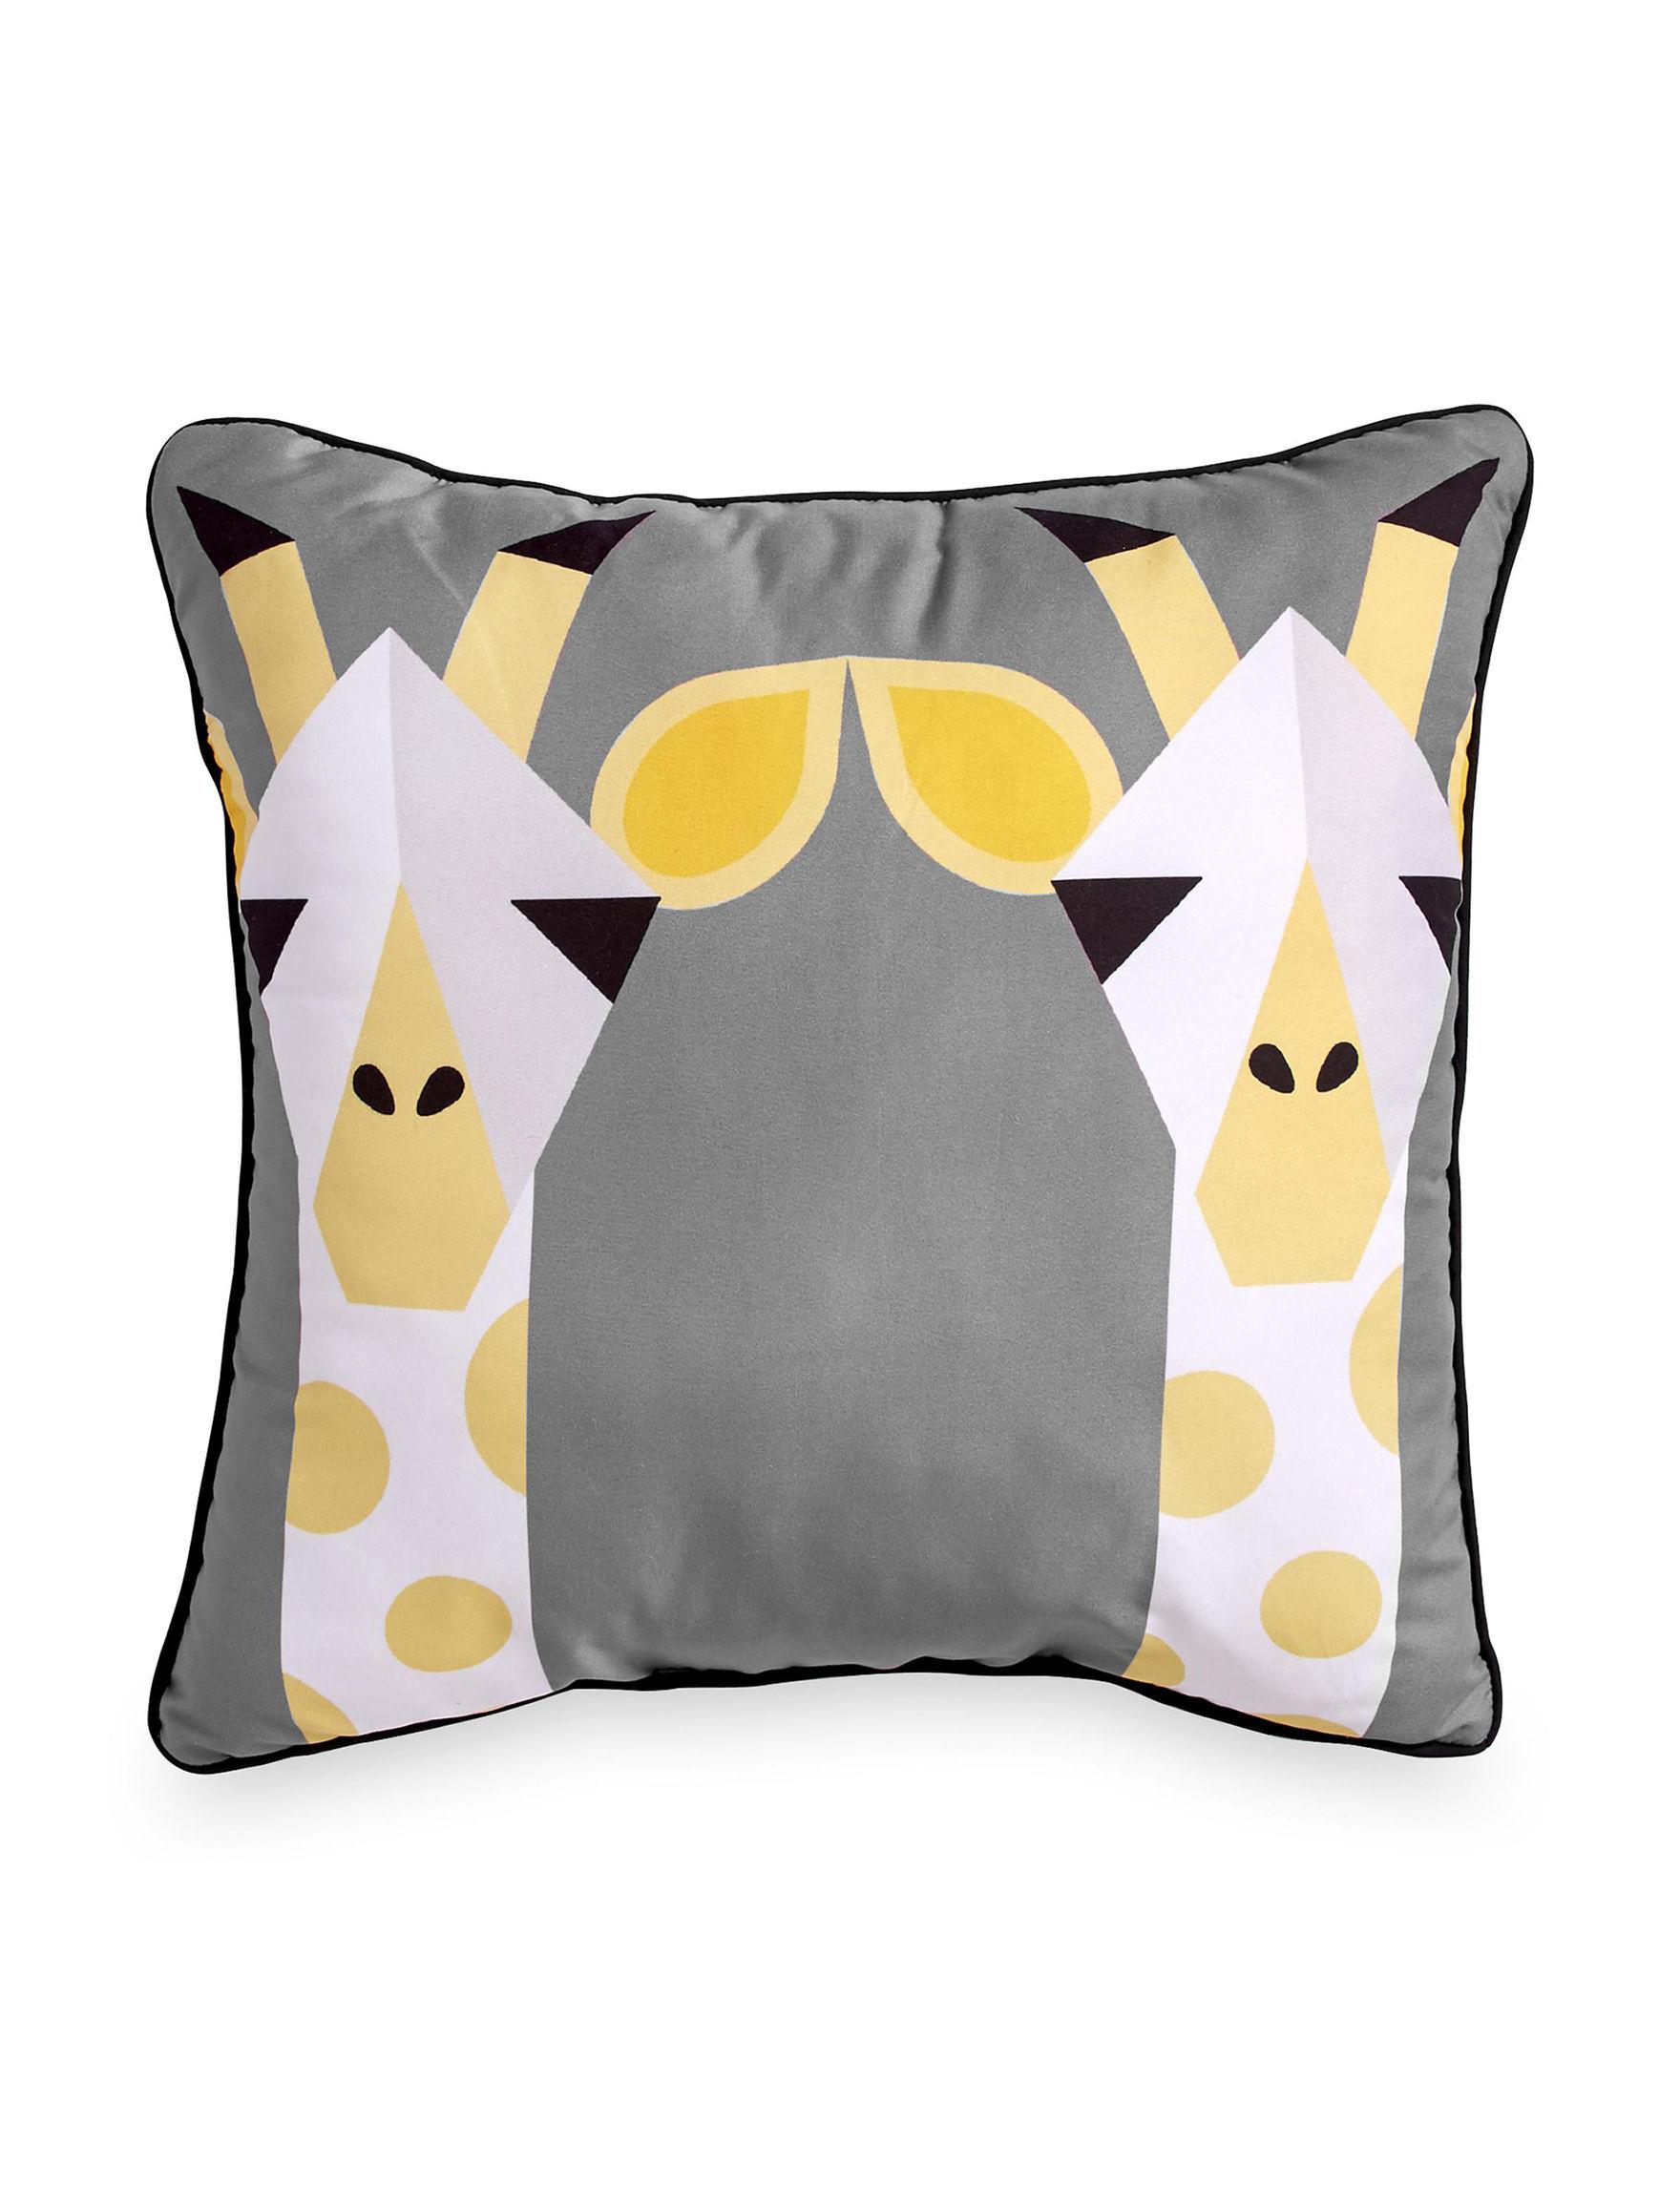 Scribble Gold Decorative Pillows